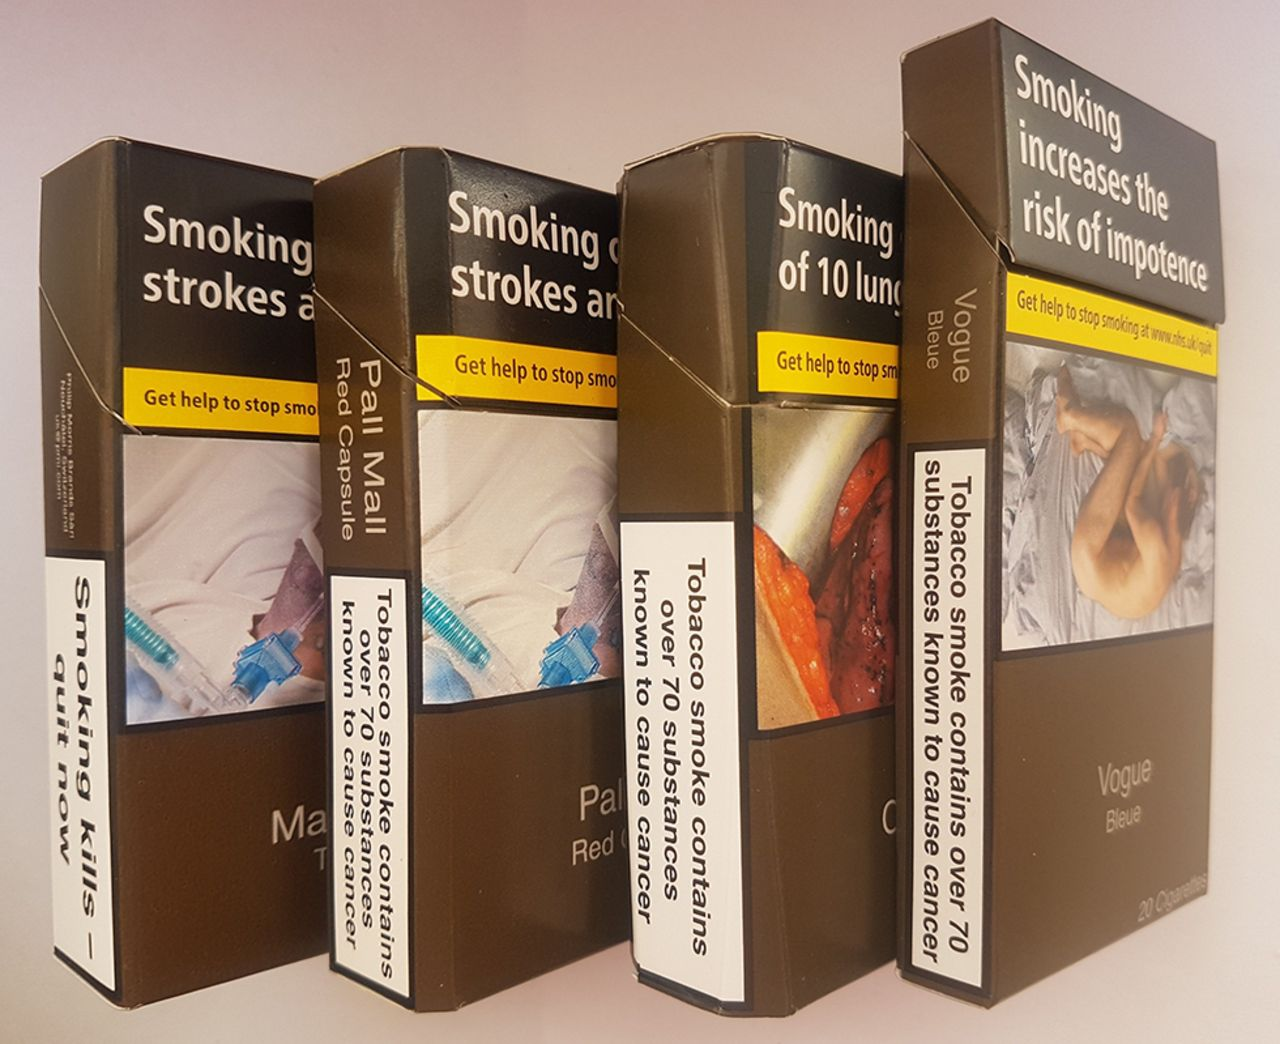 Canadian cigarettes similar to Marlboro